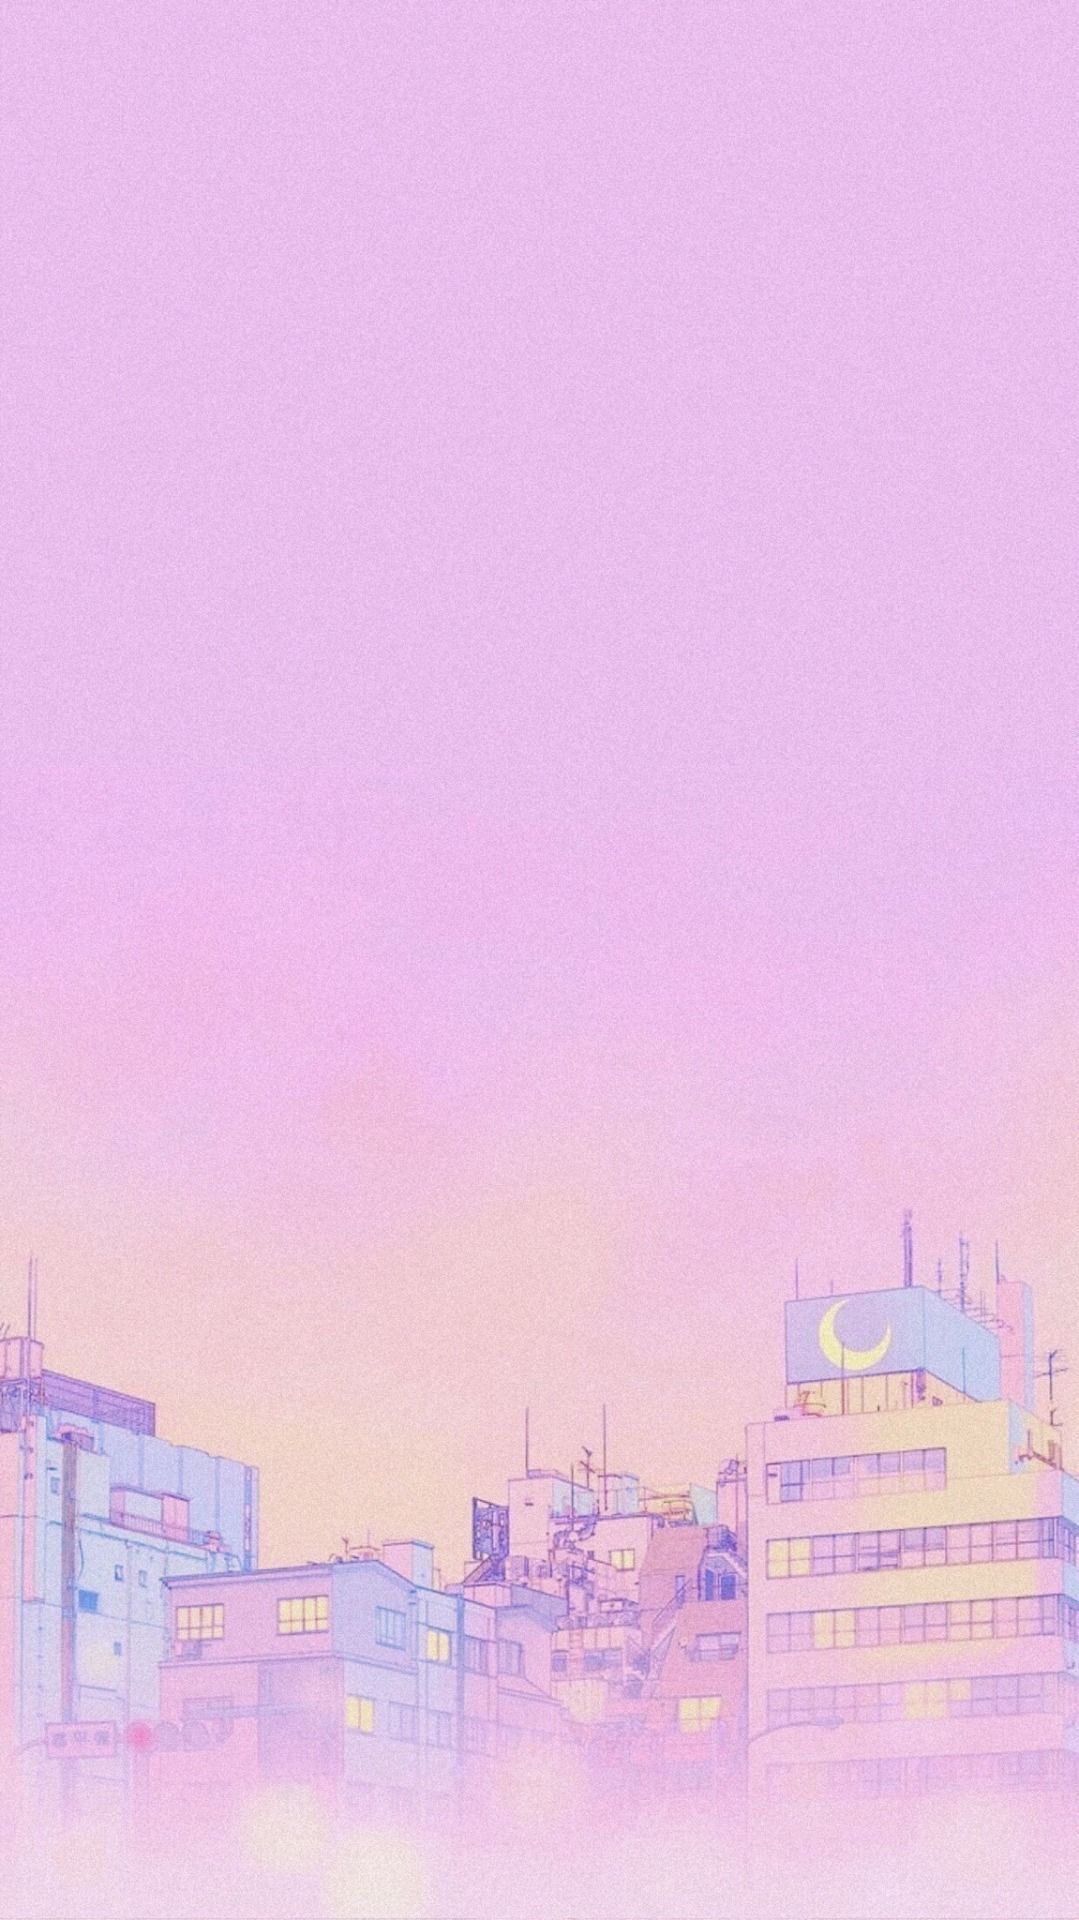 Pink Anime Wallpaper In 2020 Cute Pastel Wallpaper Kawaii Wallpaper Anime Wallpaper Iphone